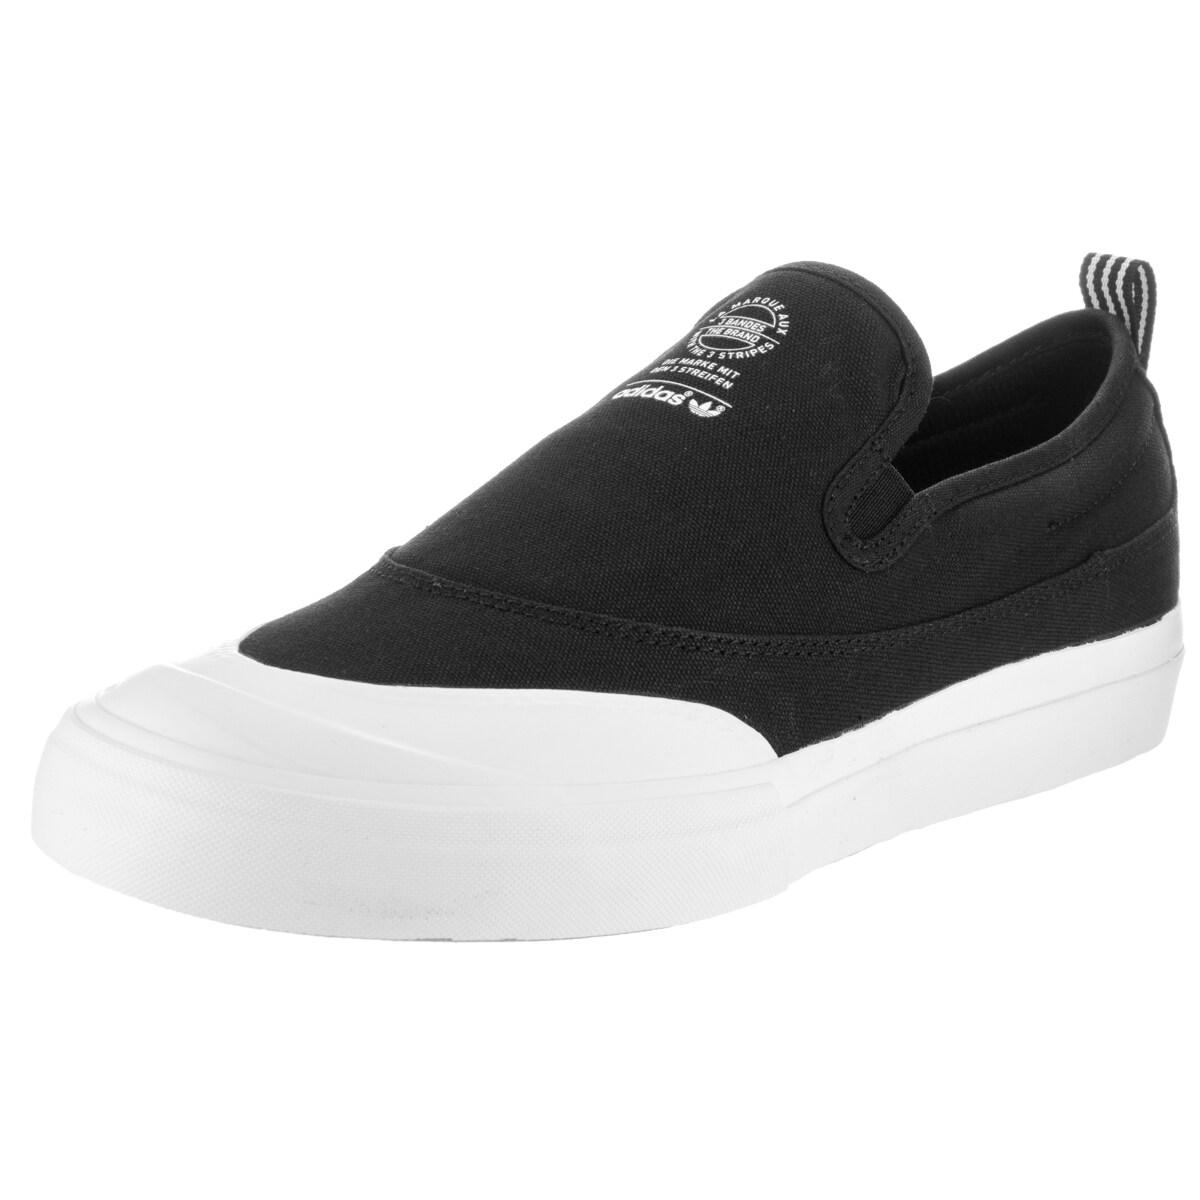 Adidas Men's Matchcourt Slip Skate Shoe